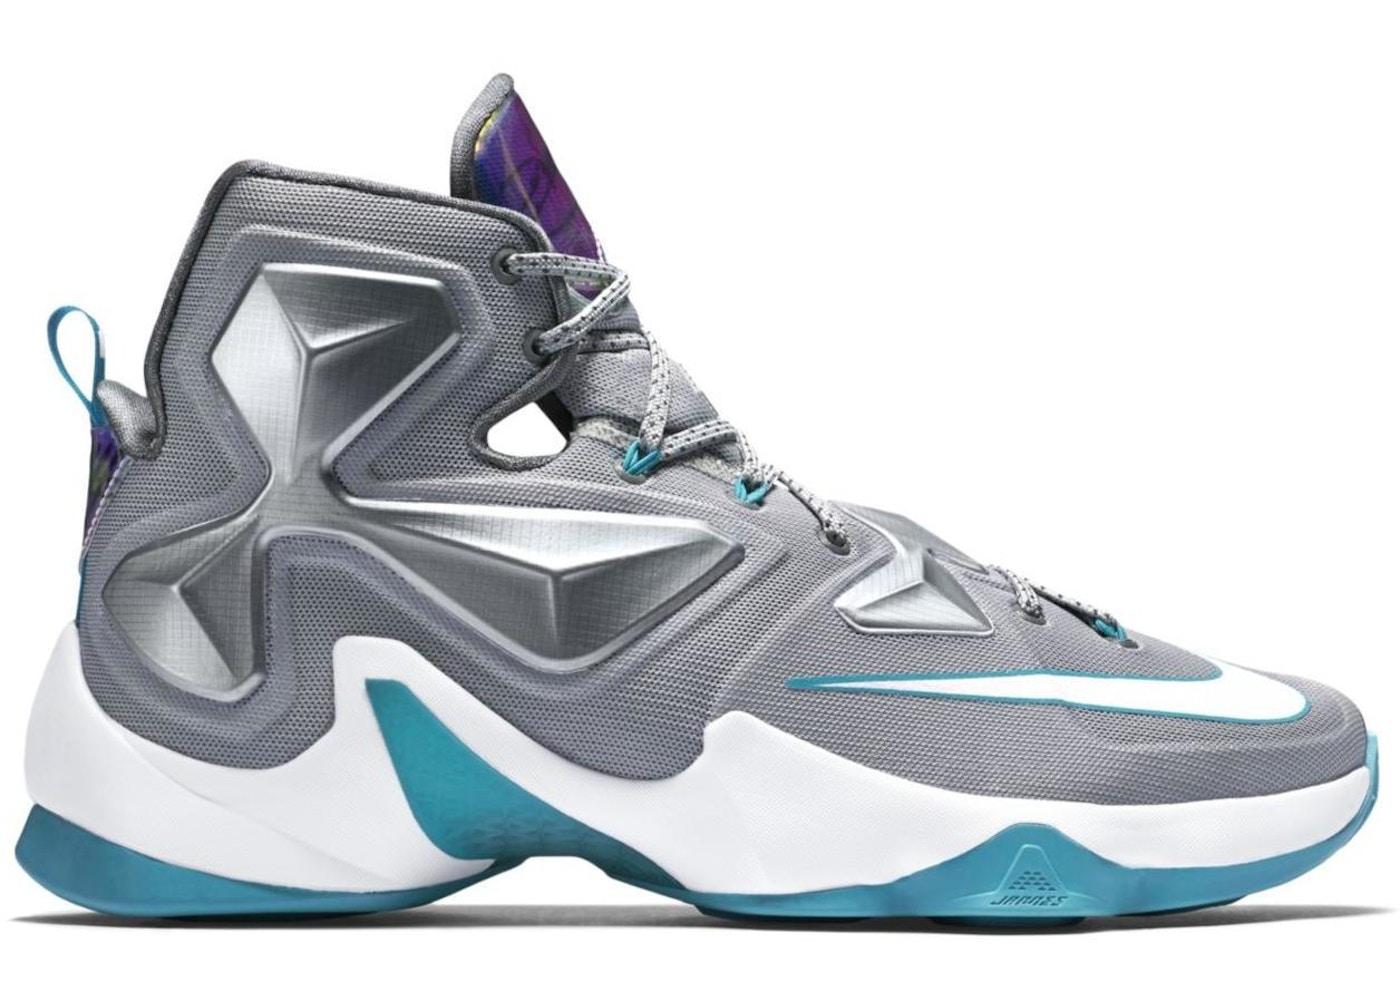 48fa45aecb71 Buy Nike LeBron 13 Shoes   Deadstock Sneakers